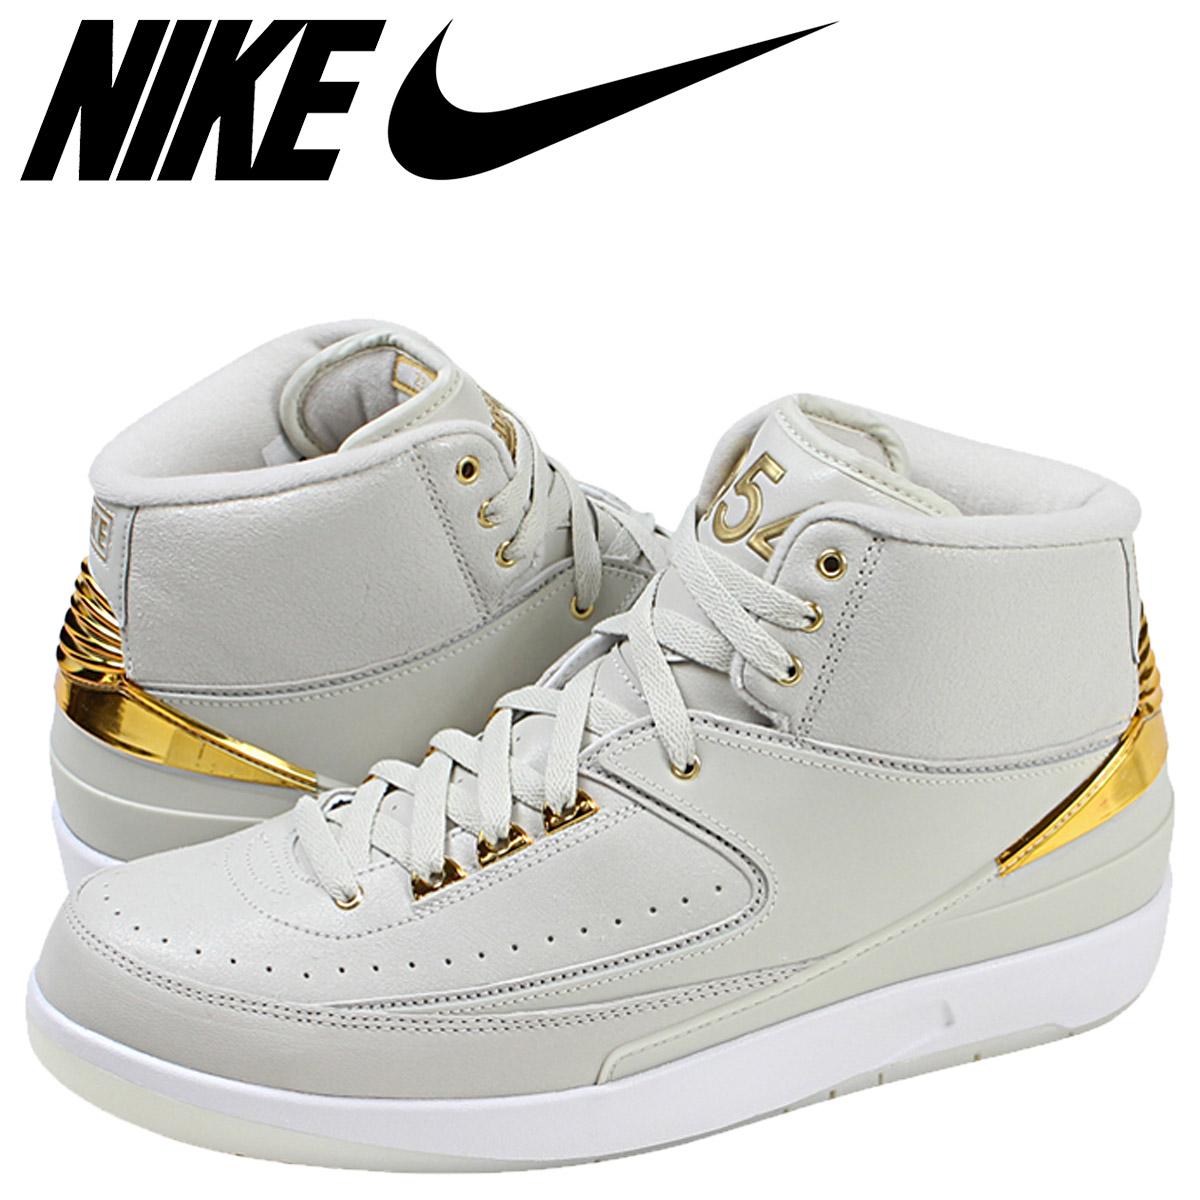 new concept a3946 d734c NIKE Nike Air Jordan sneakers AIR JORDAN 2 RETRO QUAI 54 Air Jordan  nostalgic 866,035-001 beige men